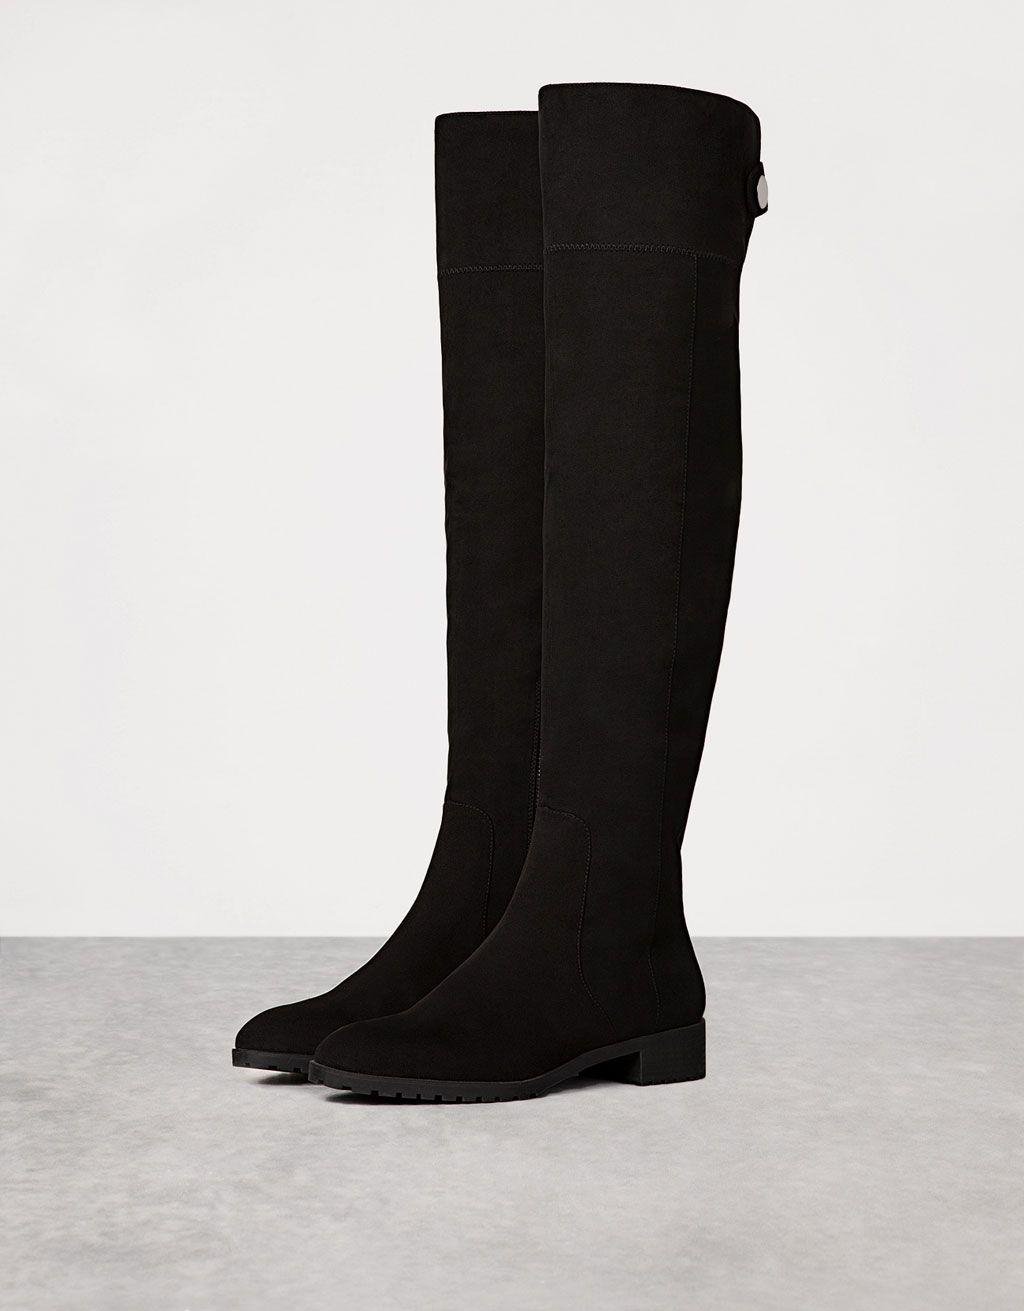 40€ Bota alta plana caña ajustada. Descubre ésta y muchas otras prendas en  Bershka con nuevos productos cada semana a4030d400da56